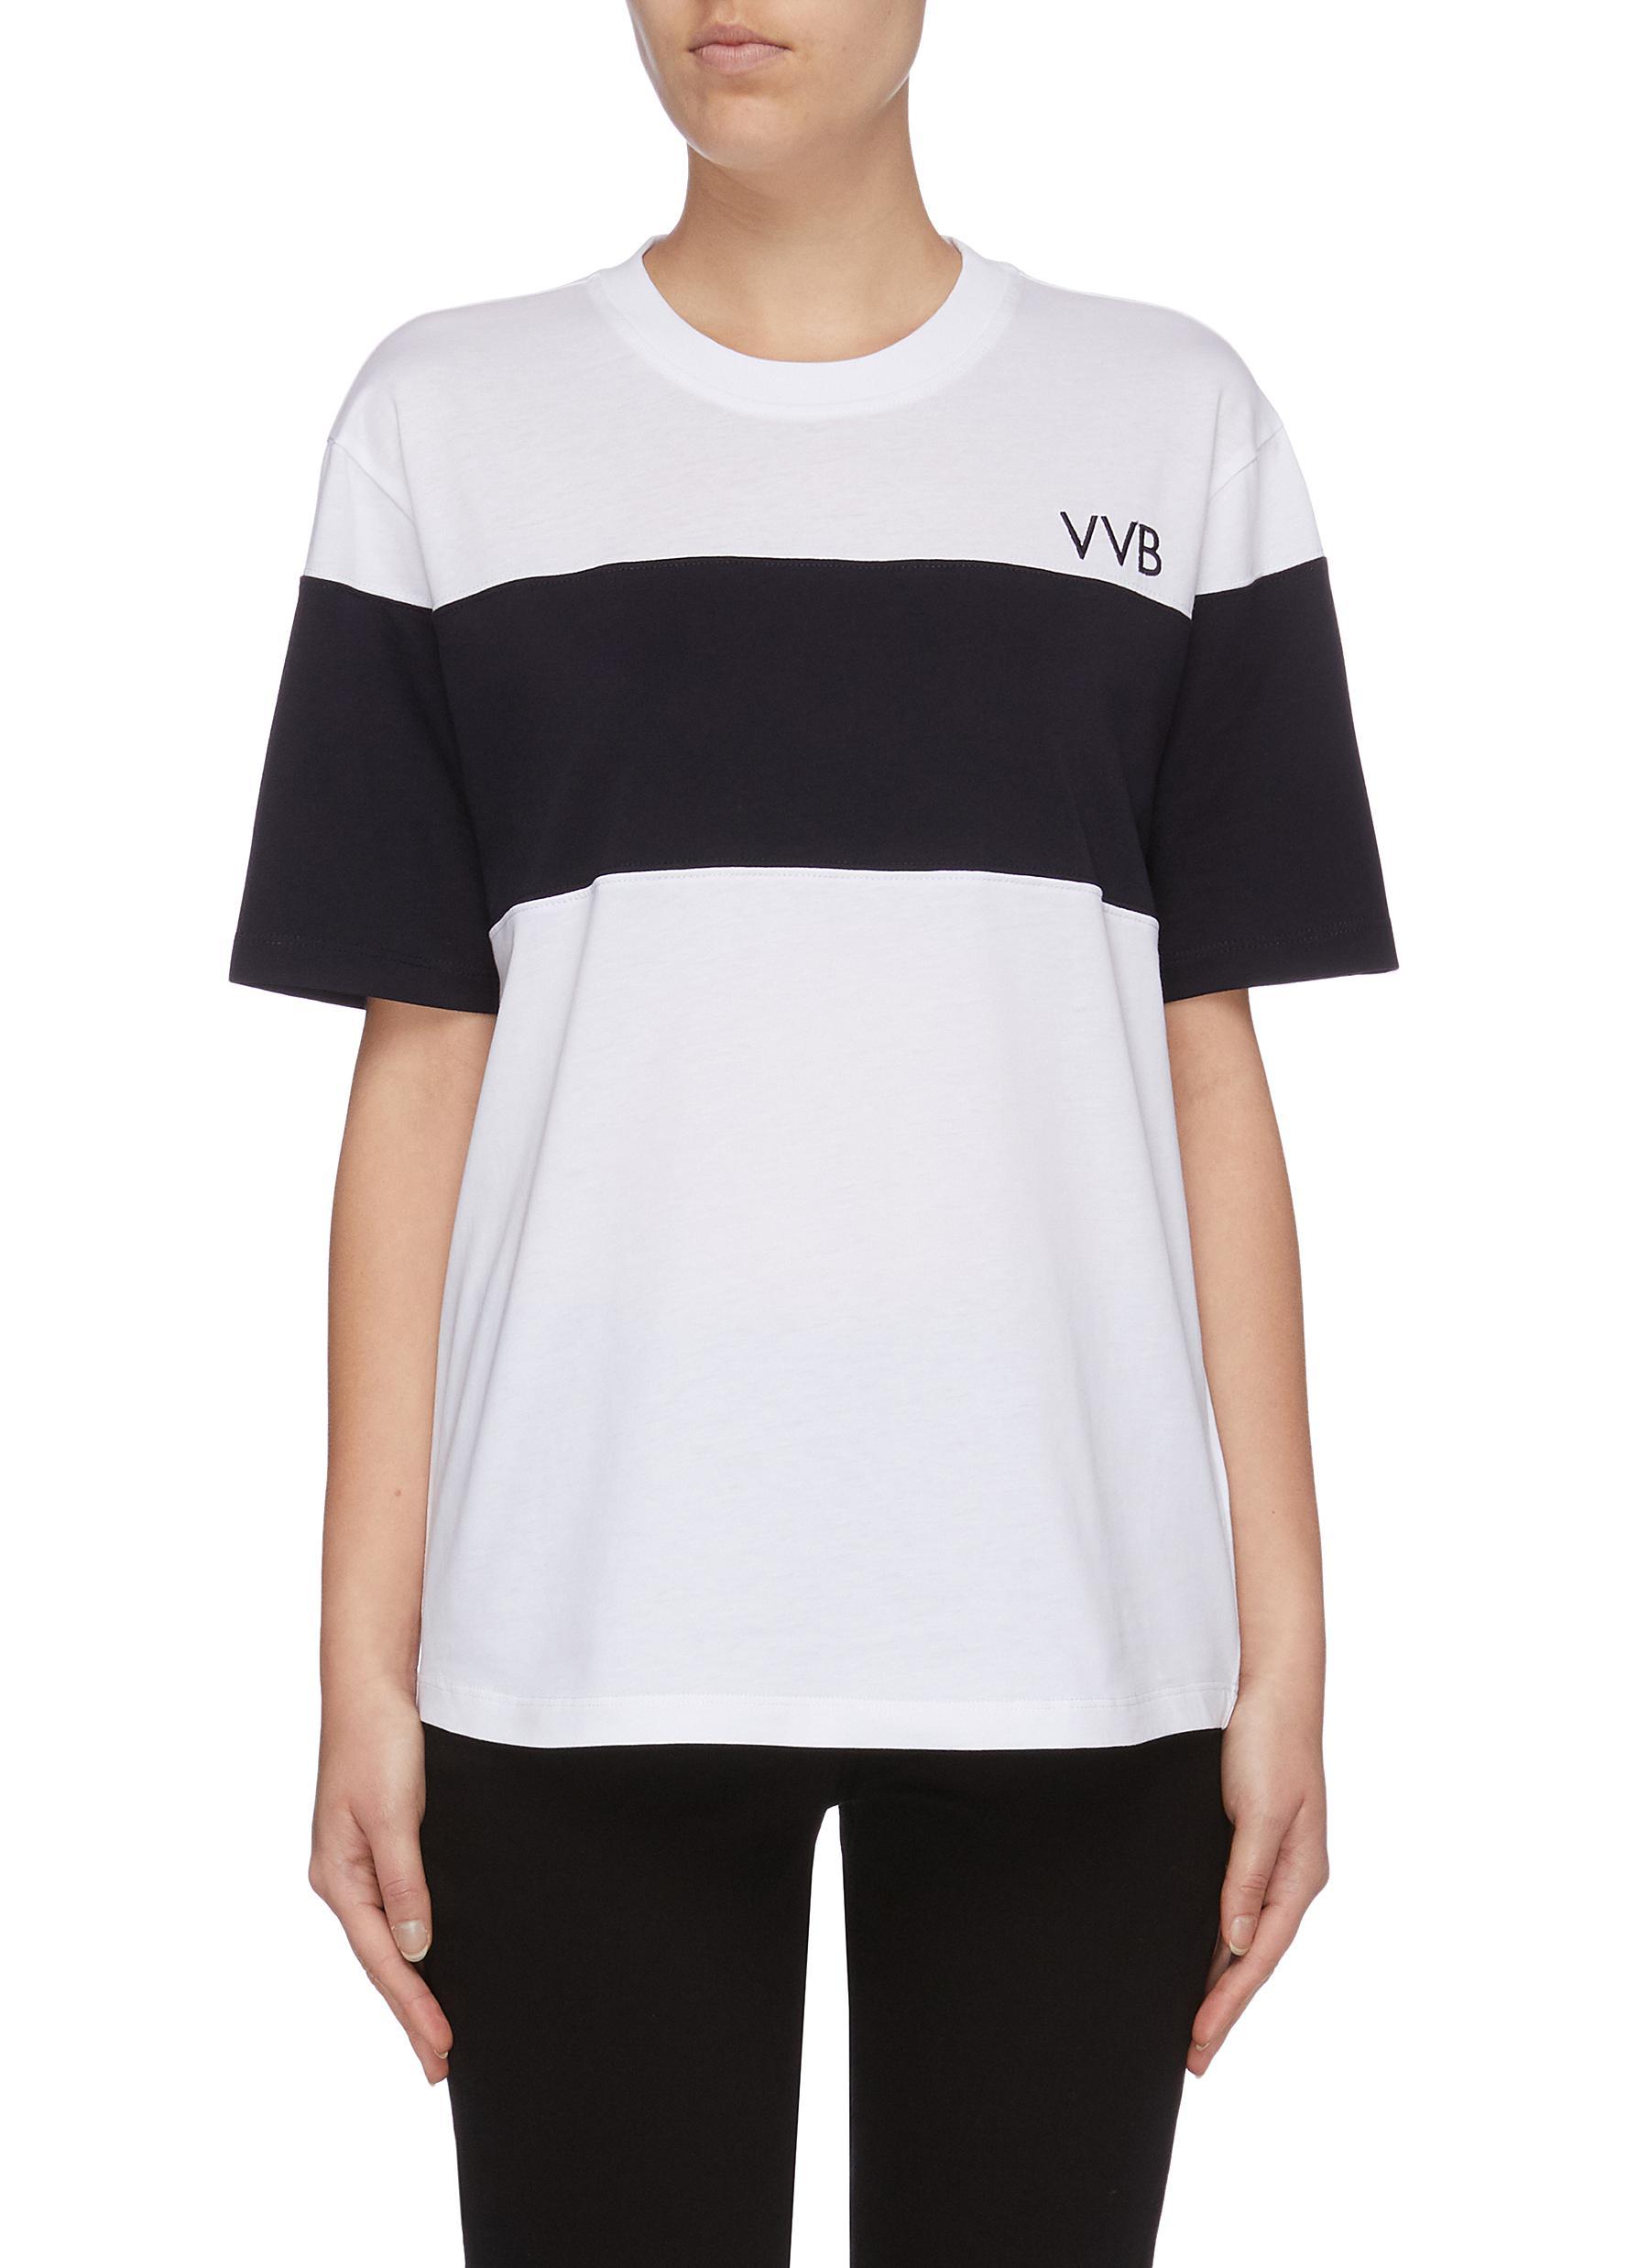 Logo print colourblock boxy T-shirt by Victoria, Victoria Beckham